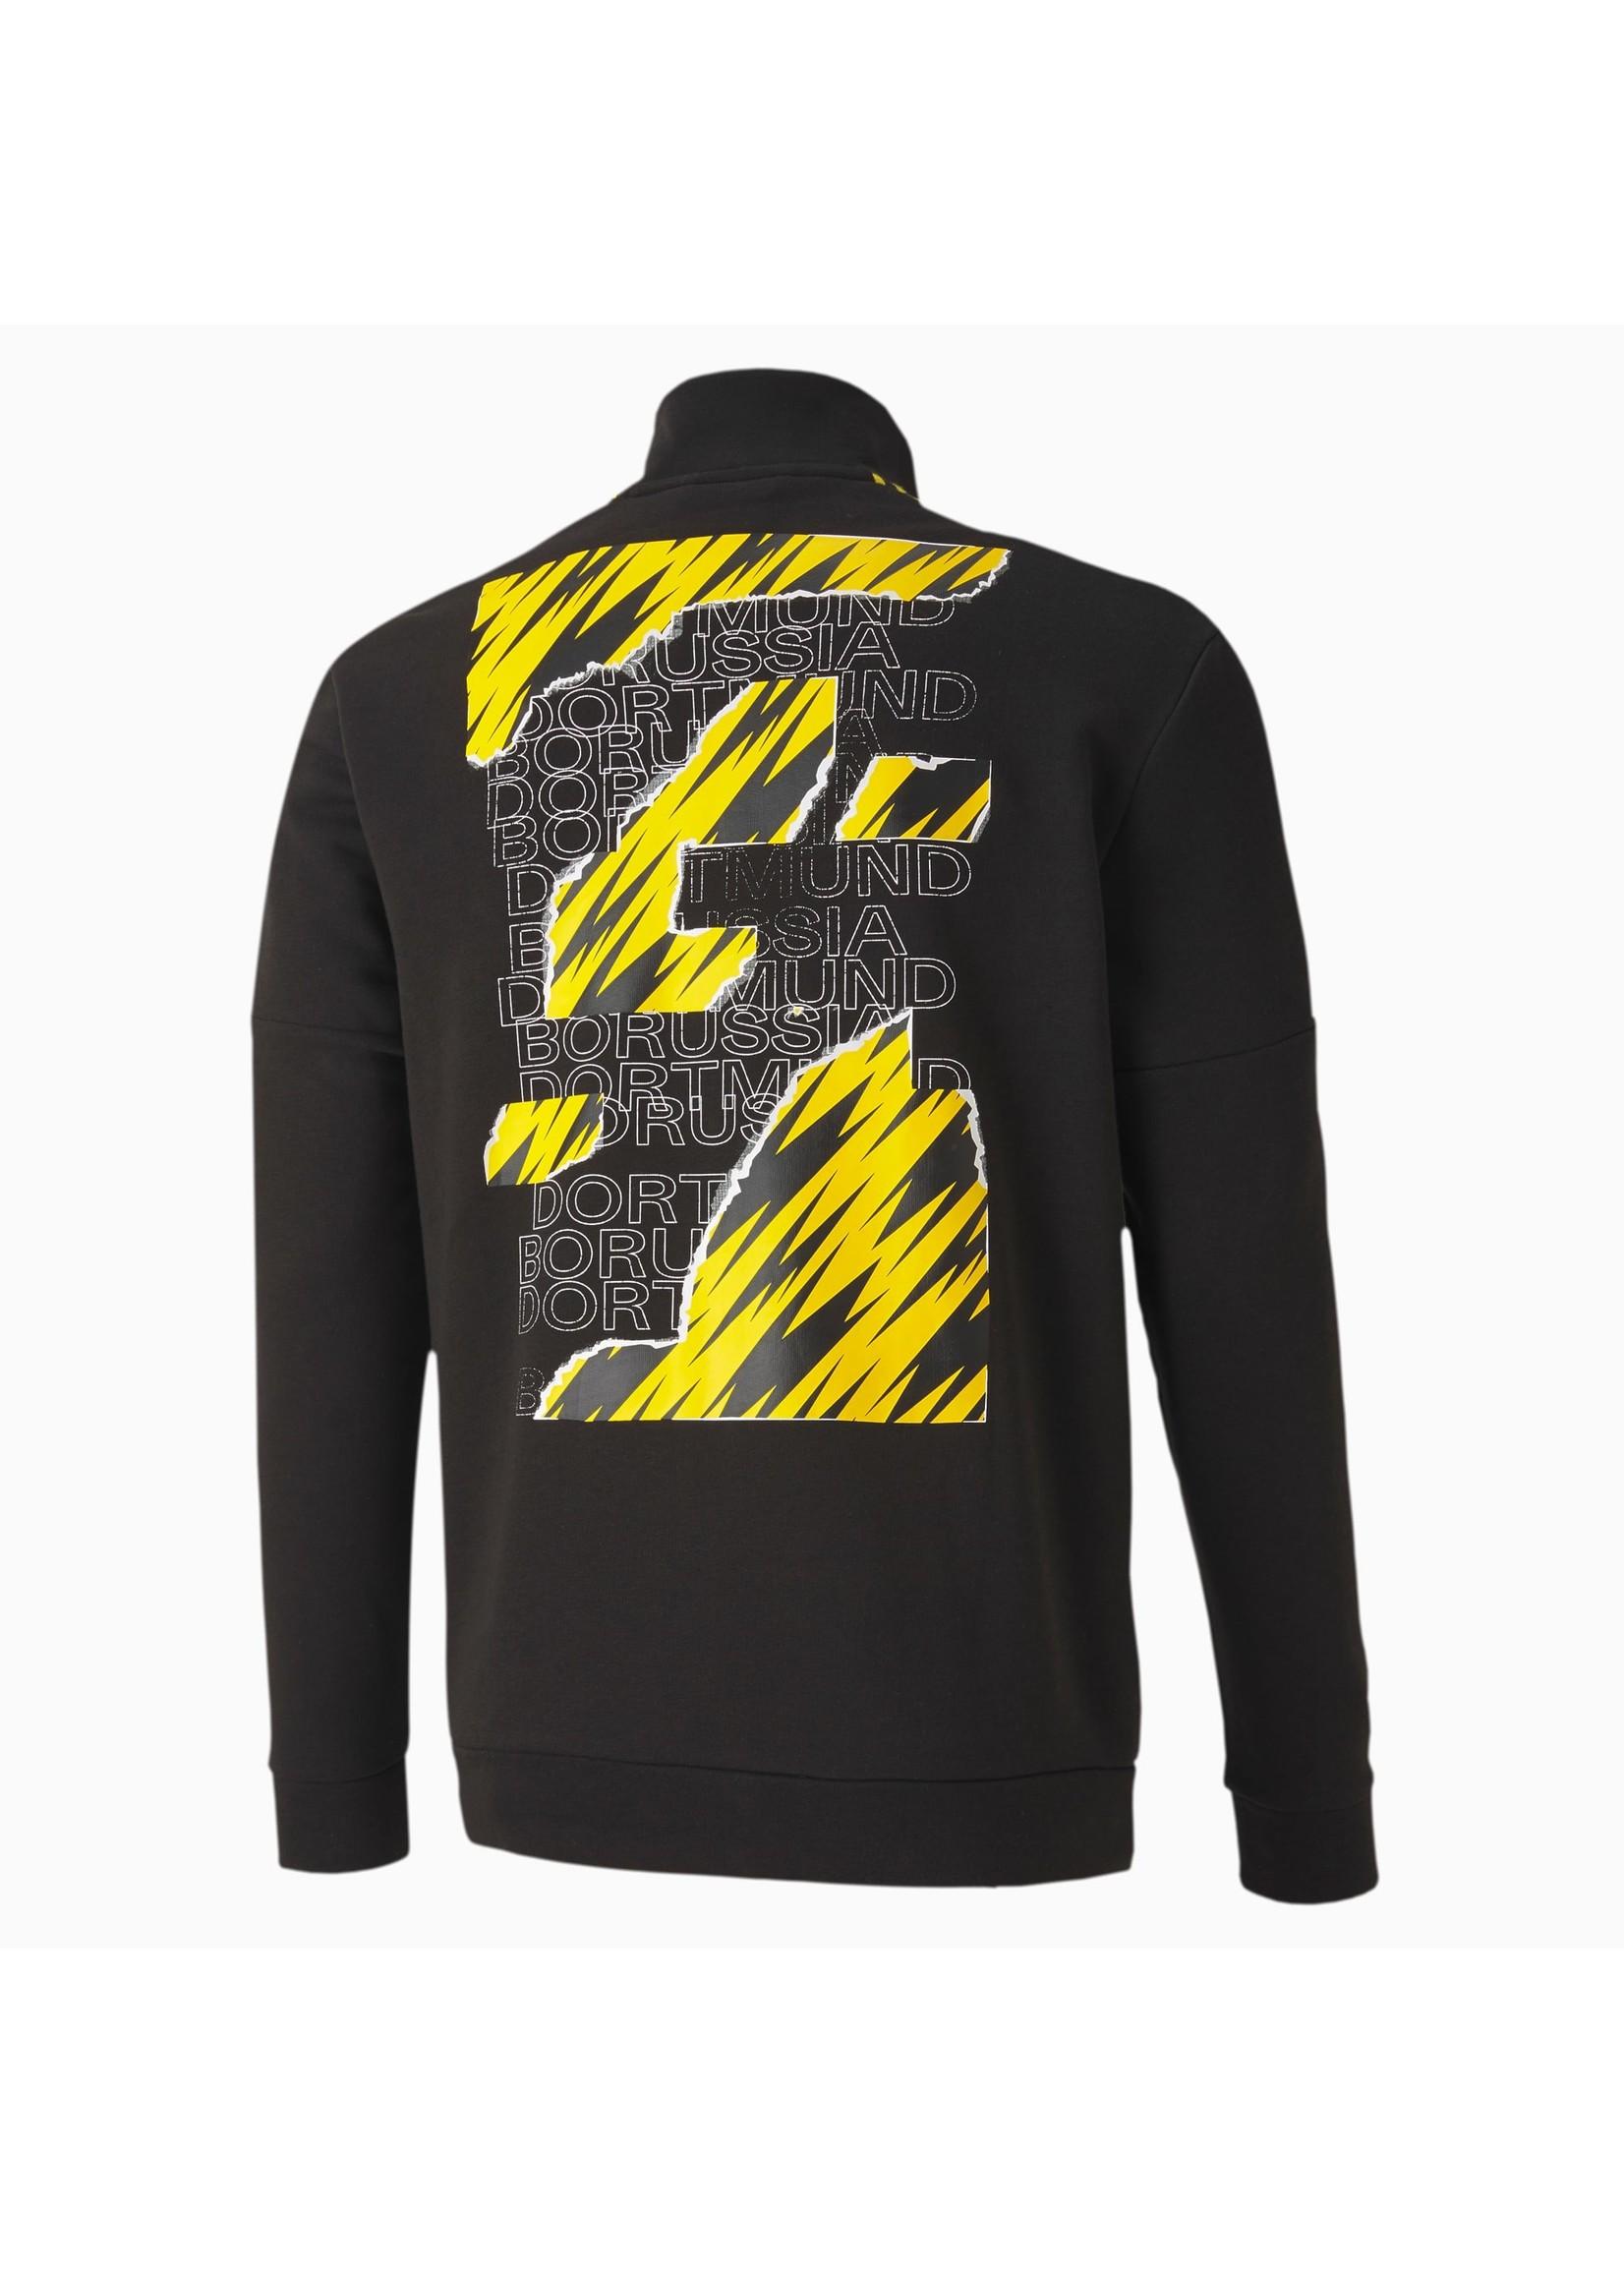 Puma Borussia Dortmund Track Jacket - 20/21 Away